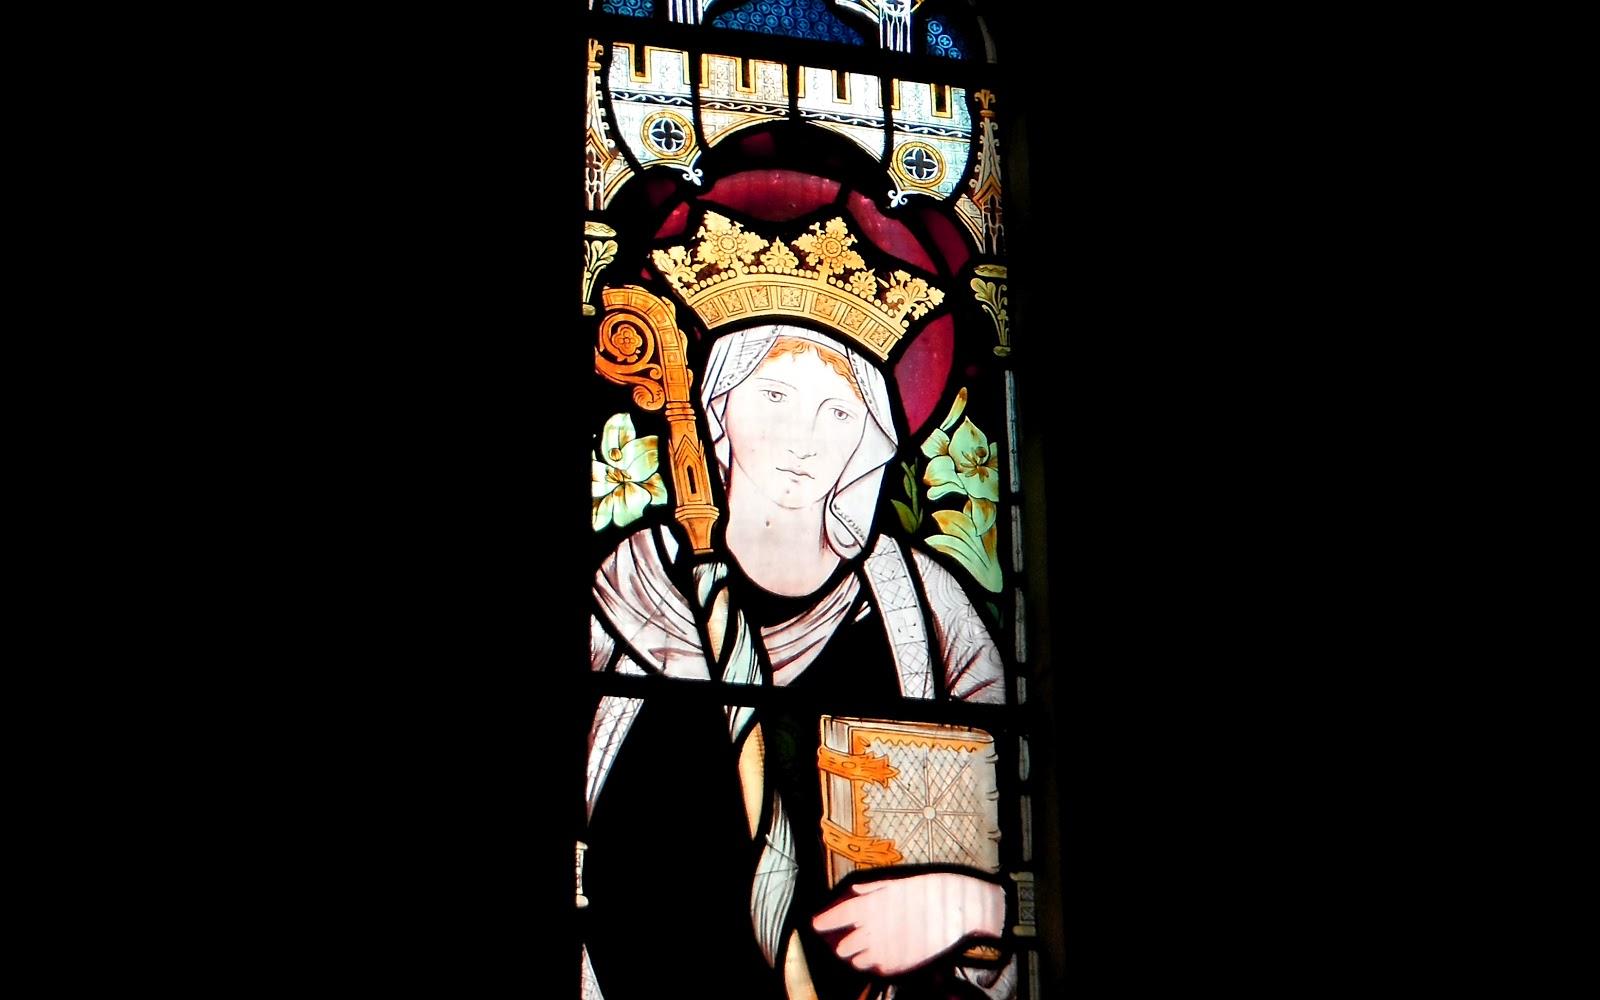 Stained-glass portrait of Saint Editha in Amington Church